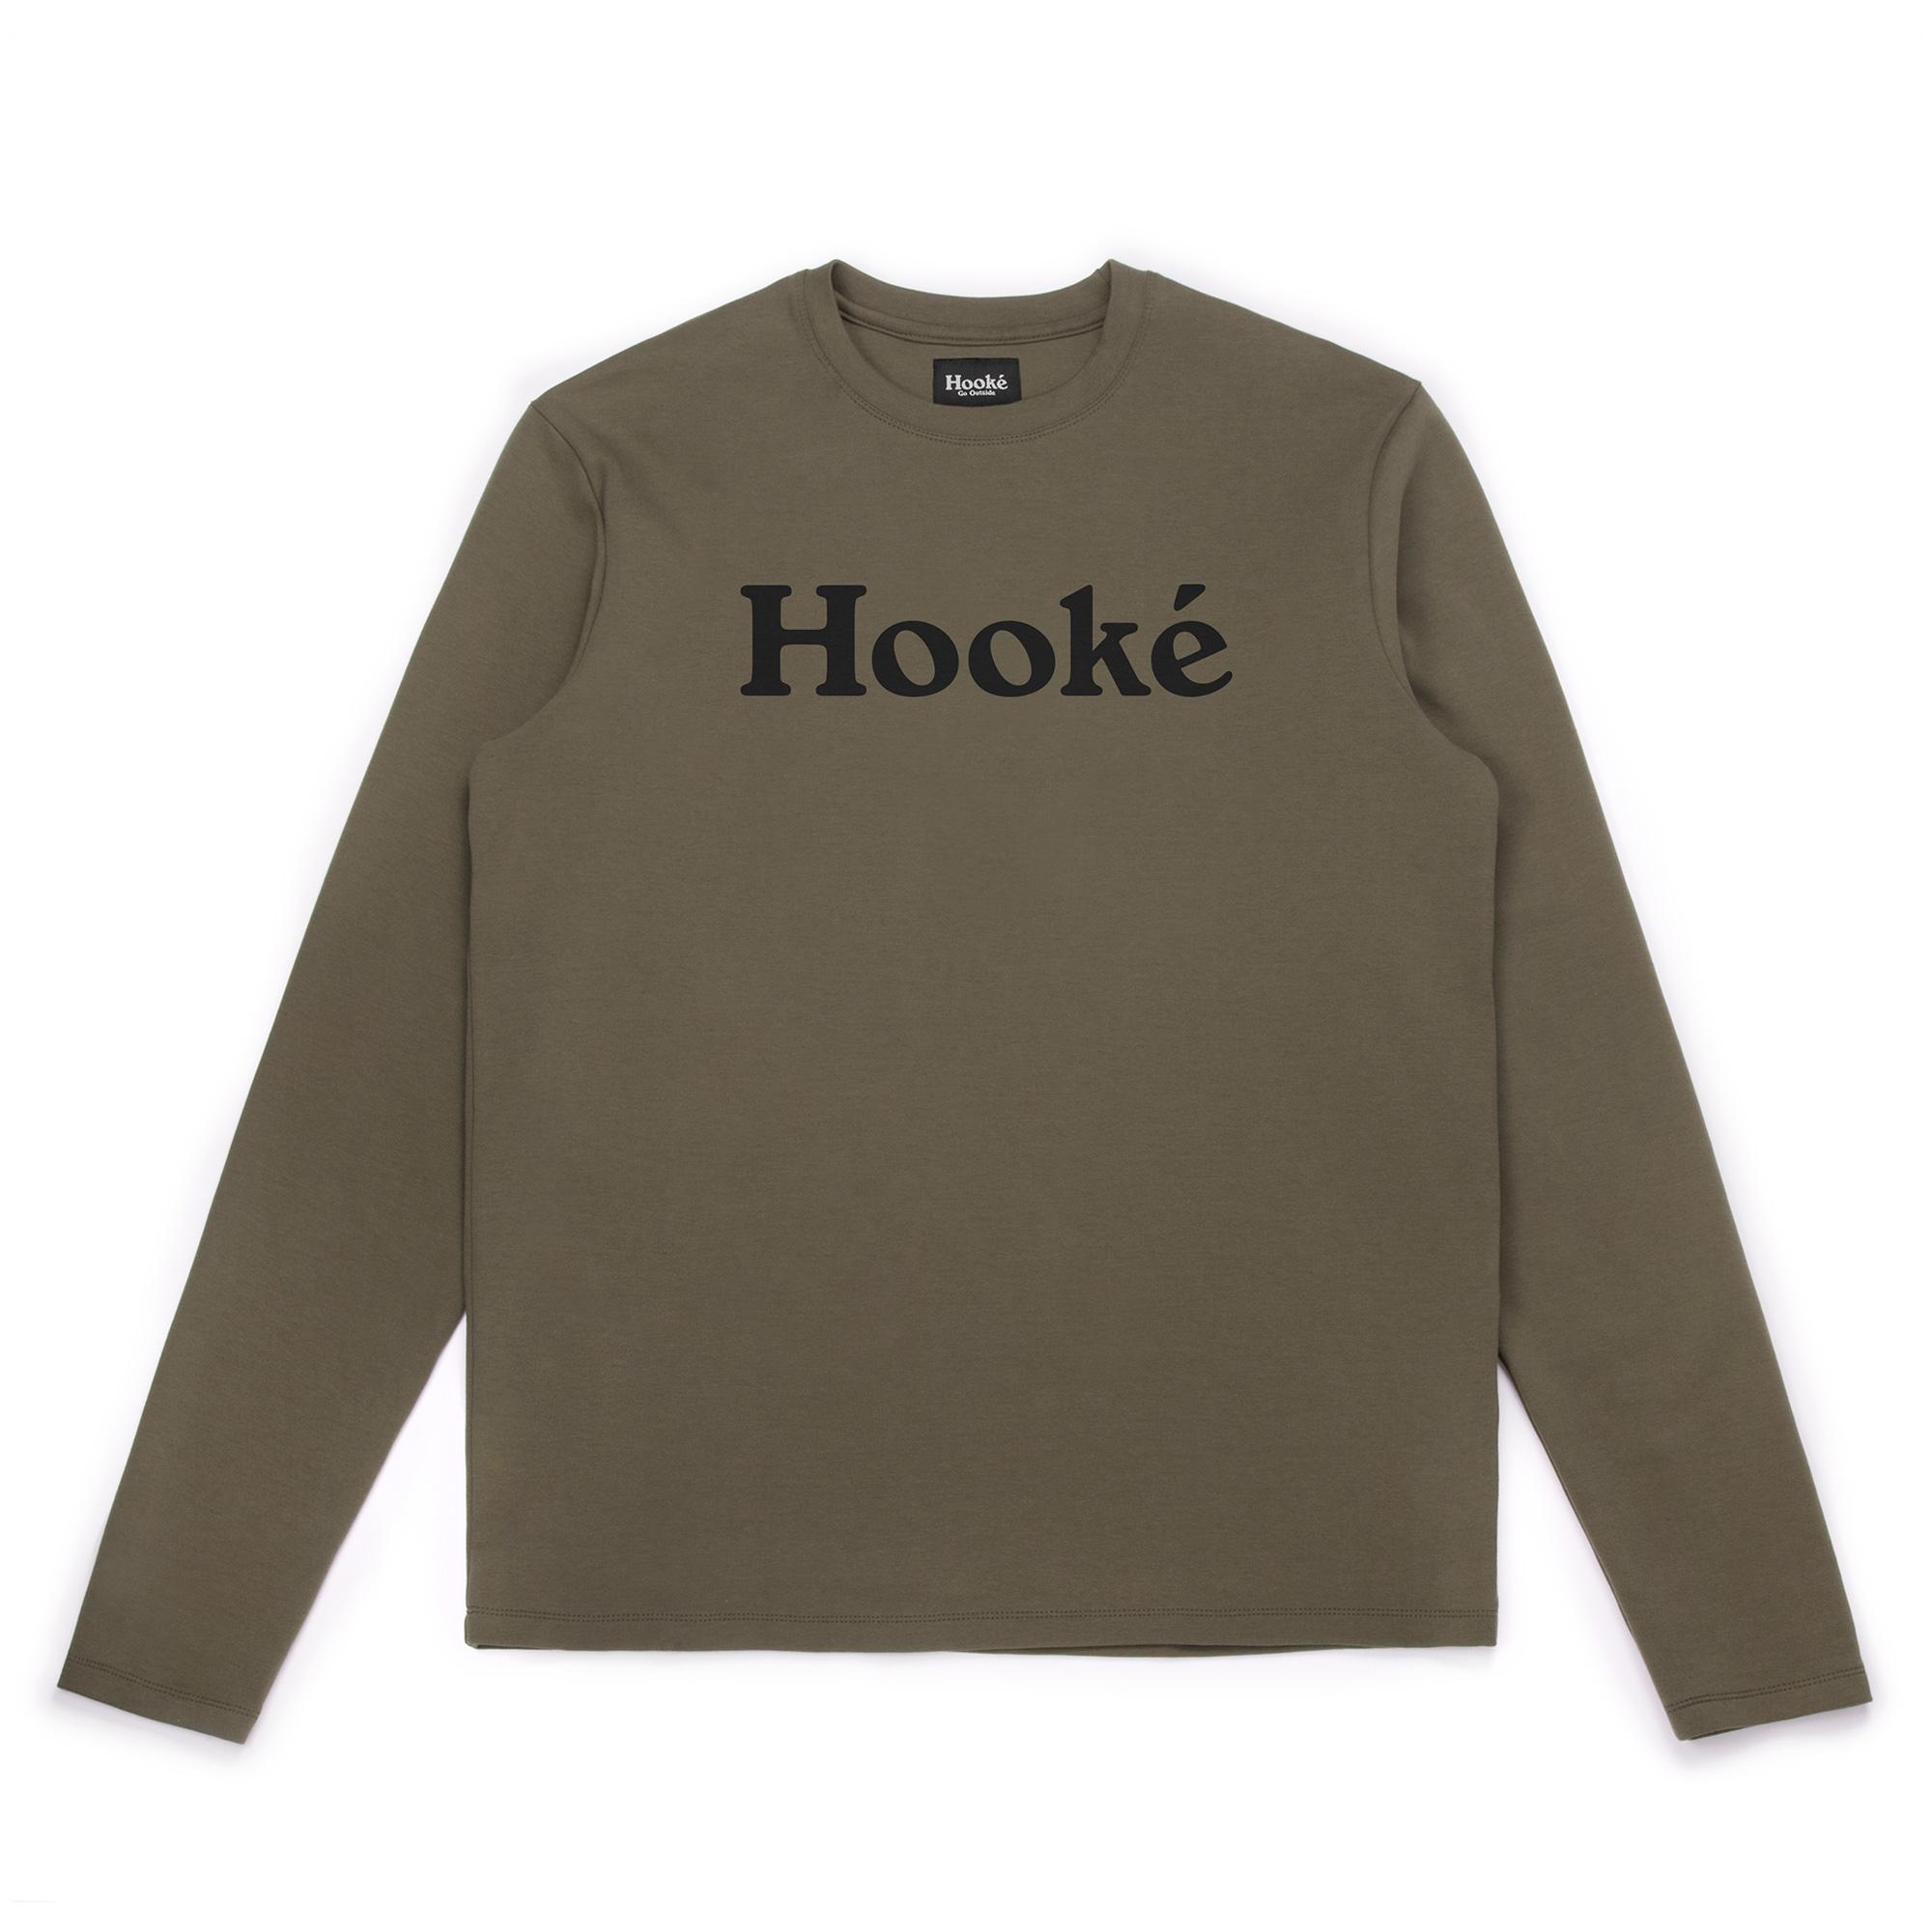 Hooké Original Long Sleeve Tee Olive